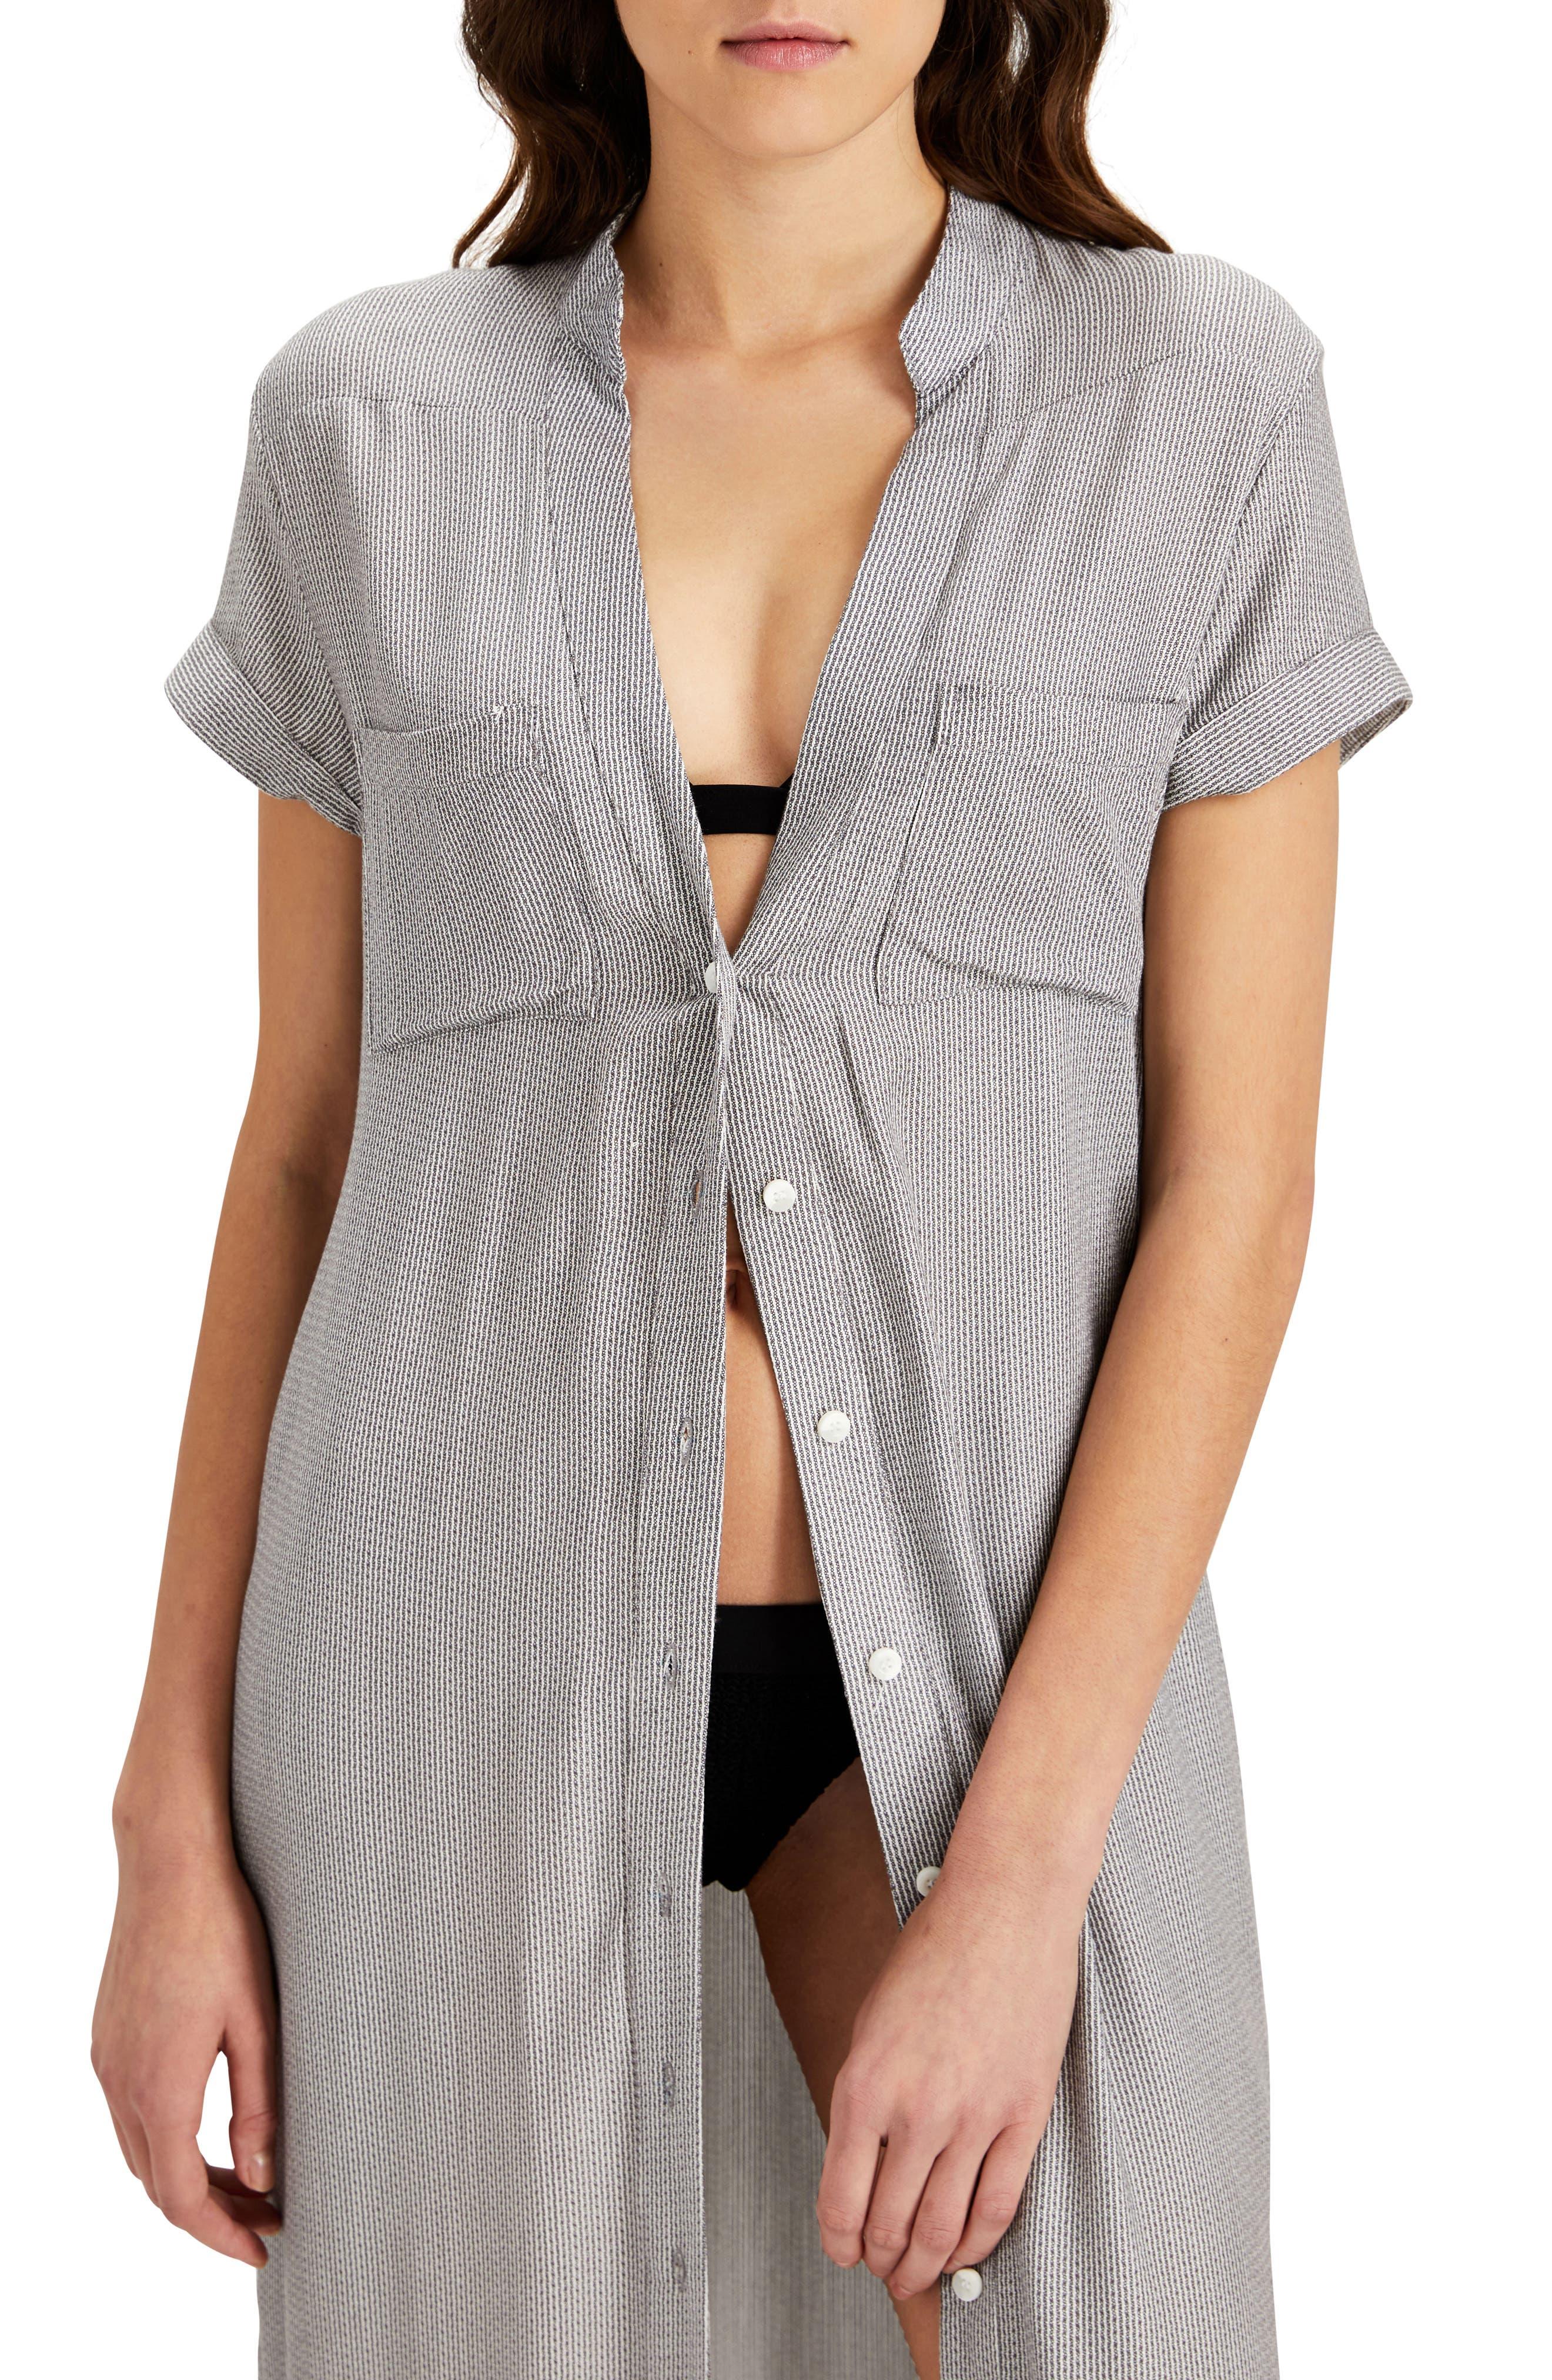 Kim Button Down Cover-Up Dress,                             Alternate thumbnail 3, color,                             022